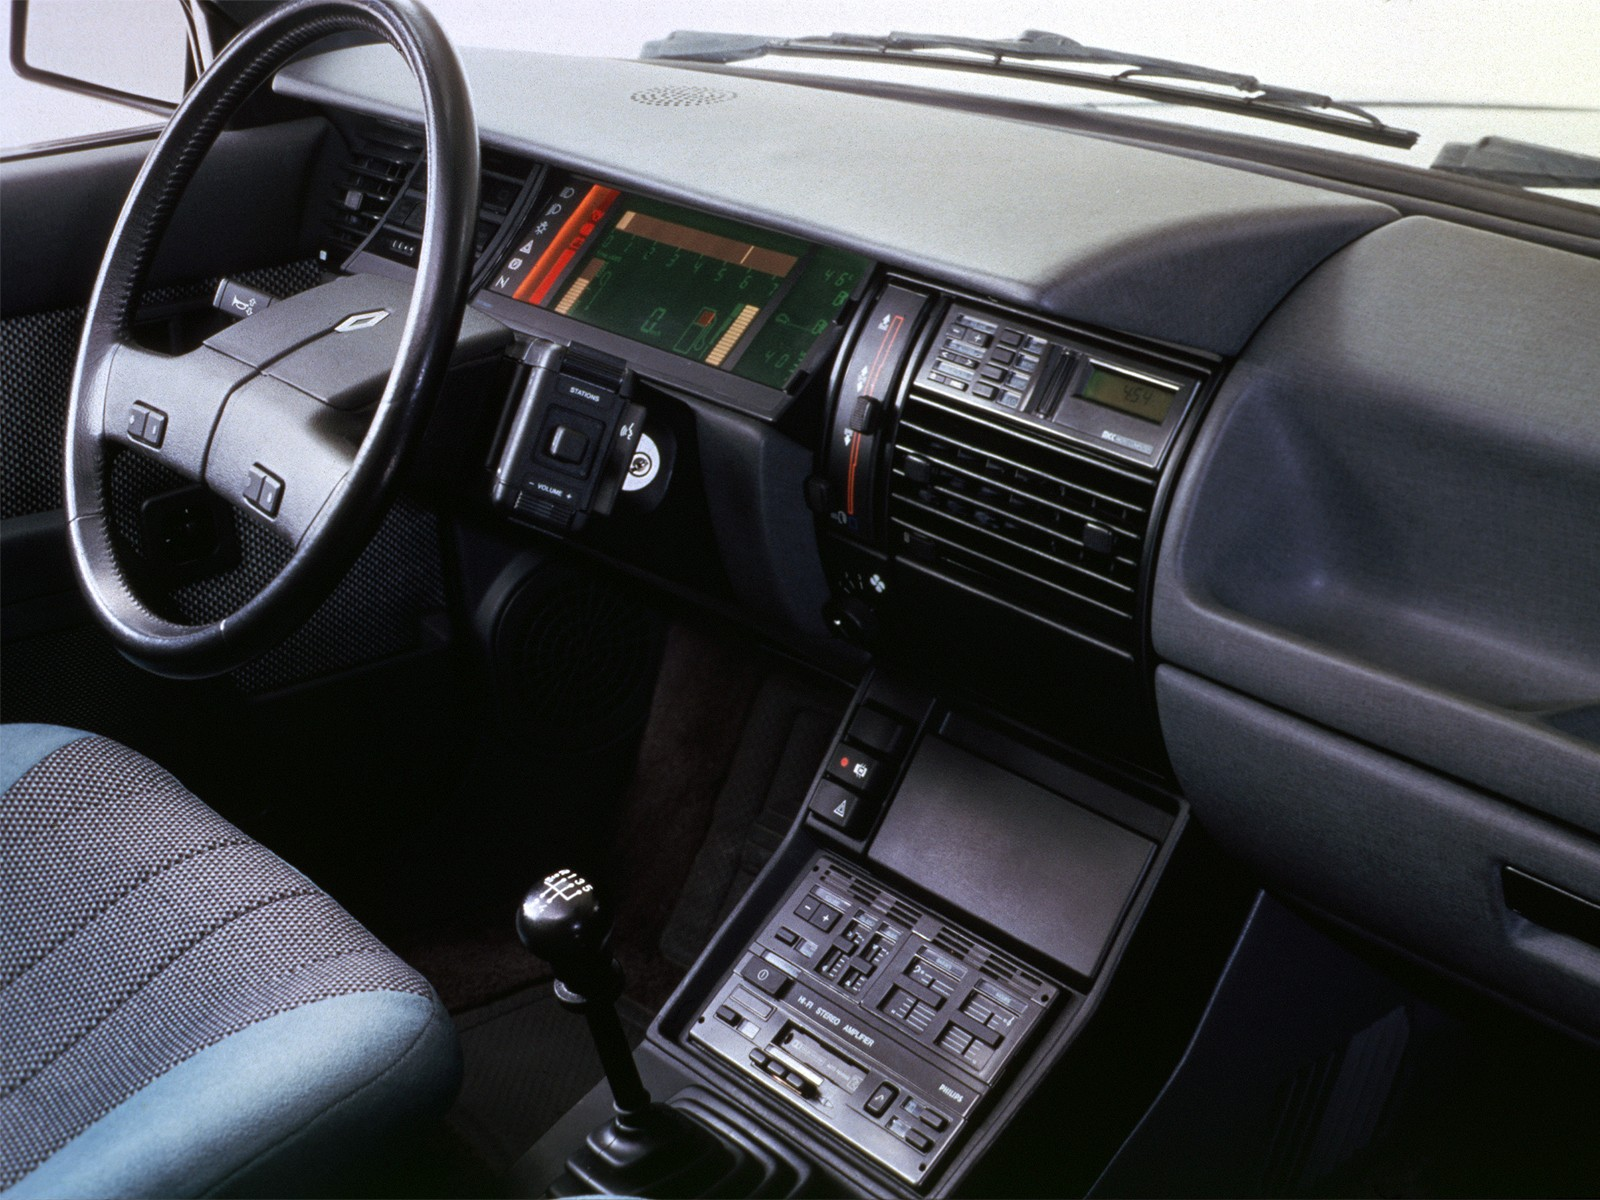 renault 11 5 door specs 1983 1984 1985 1986 autoevolution. Black Bedroom Furniture Sets. Home Design Ideas